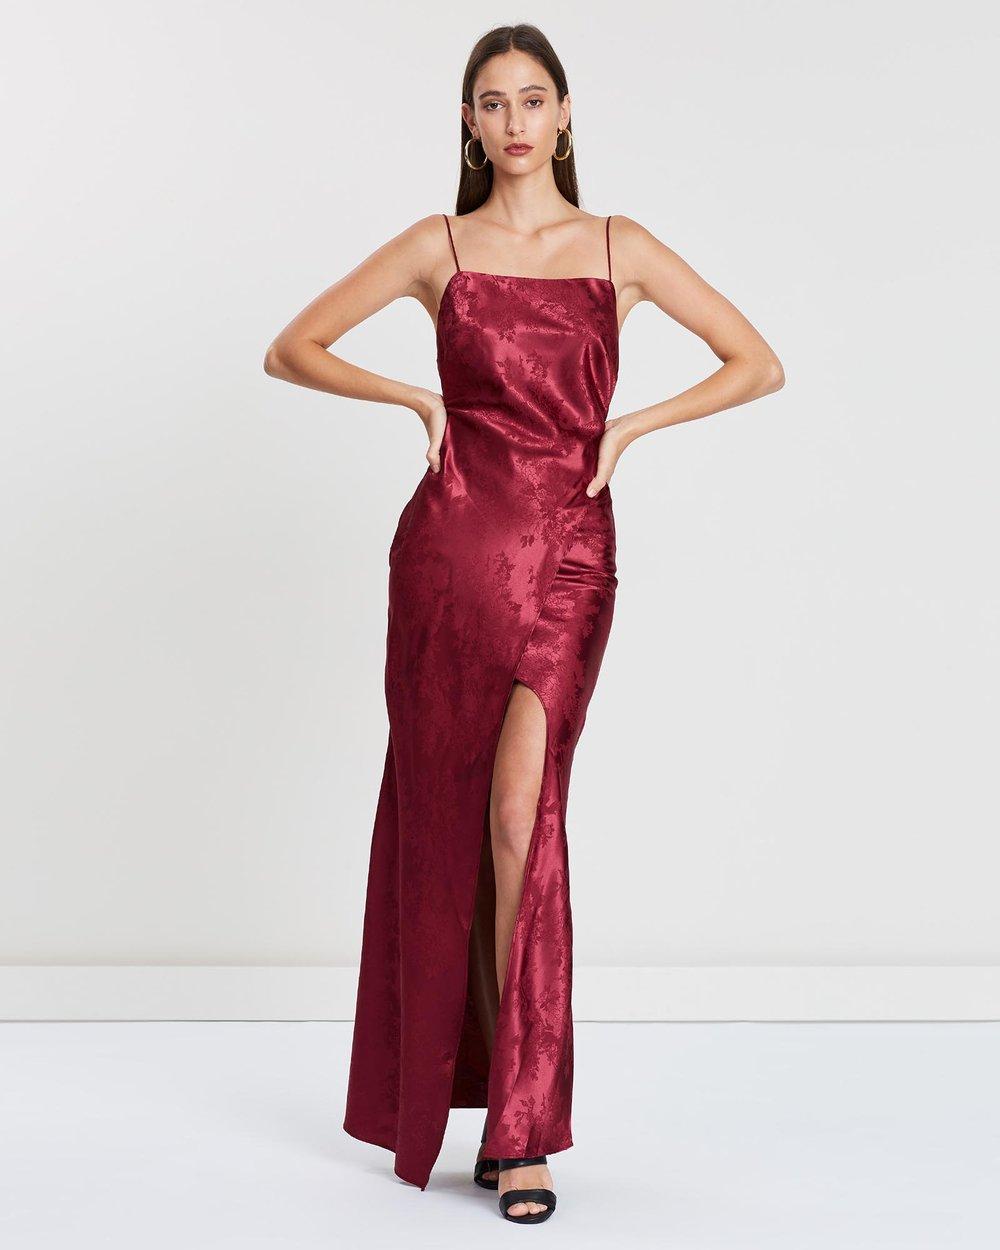 e52f17bafb2 Kensington Maxi Dress by Winona Online